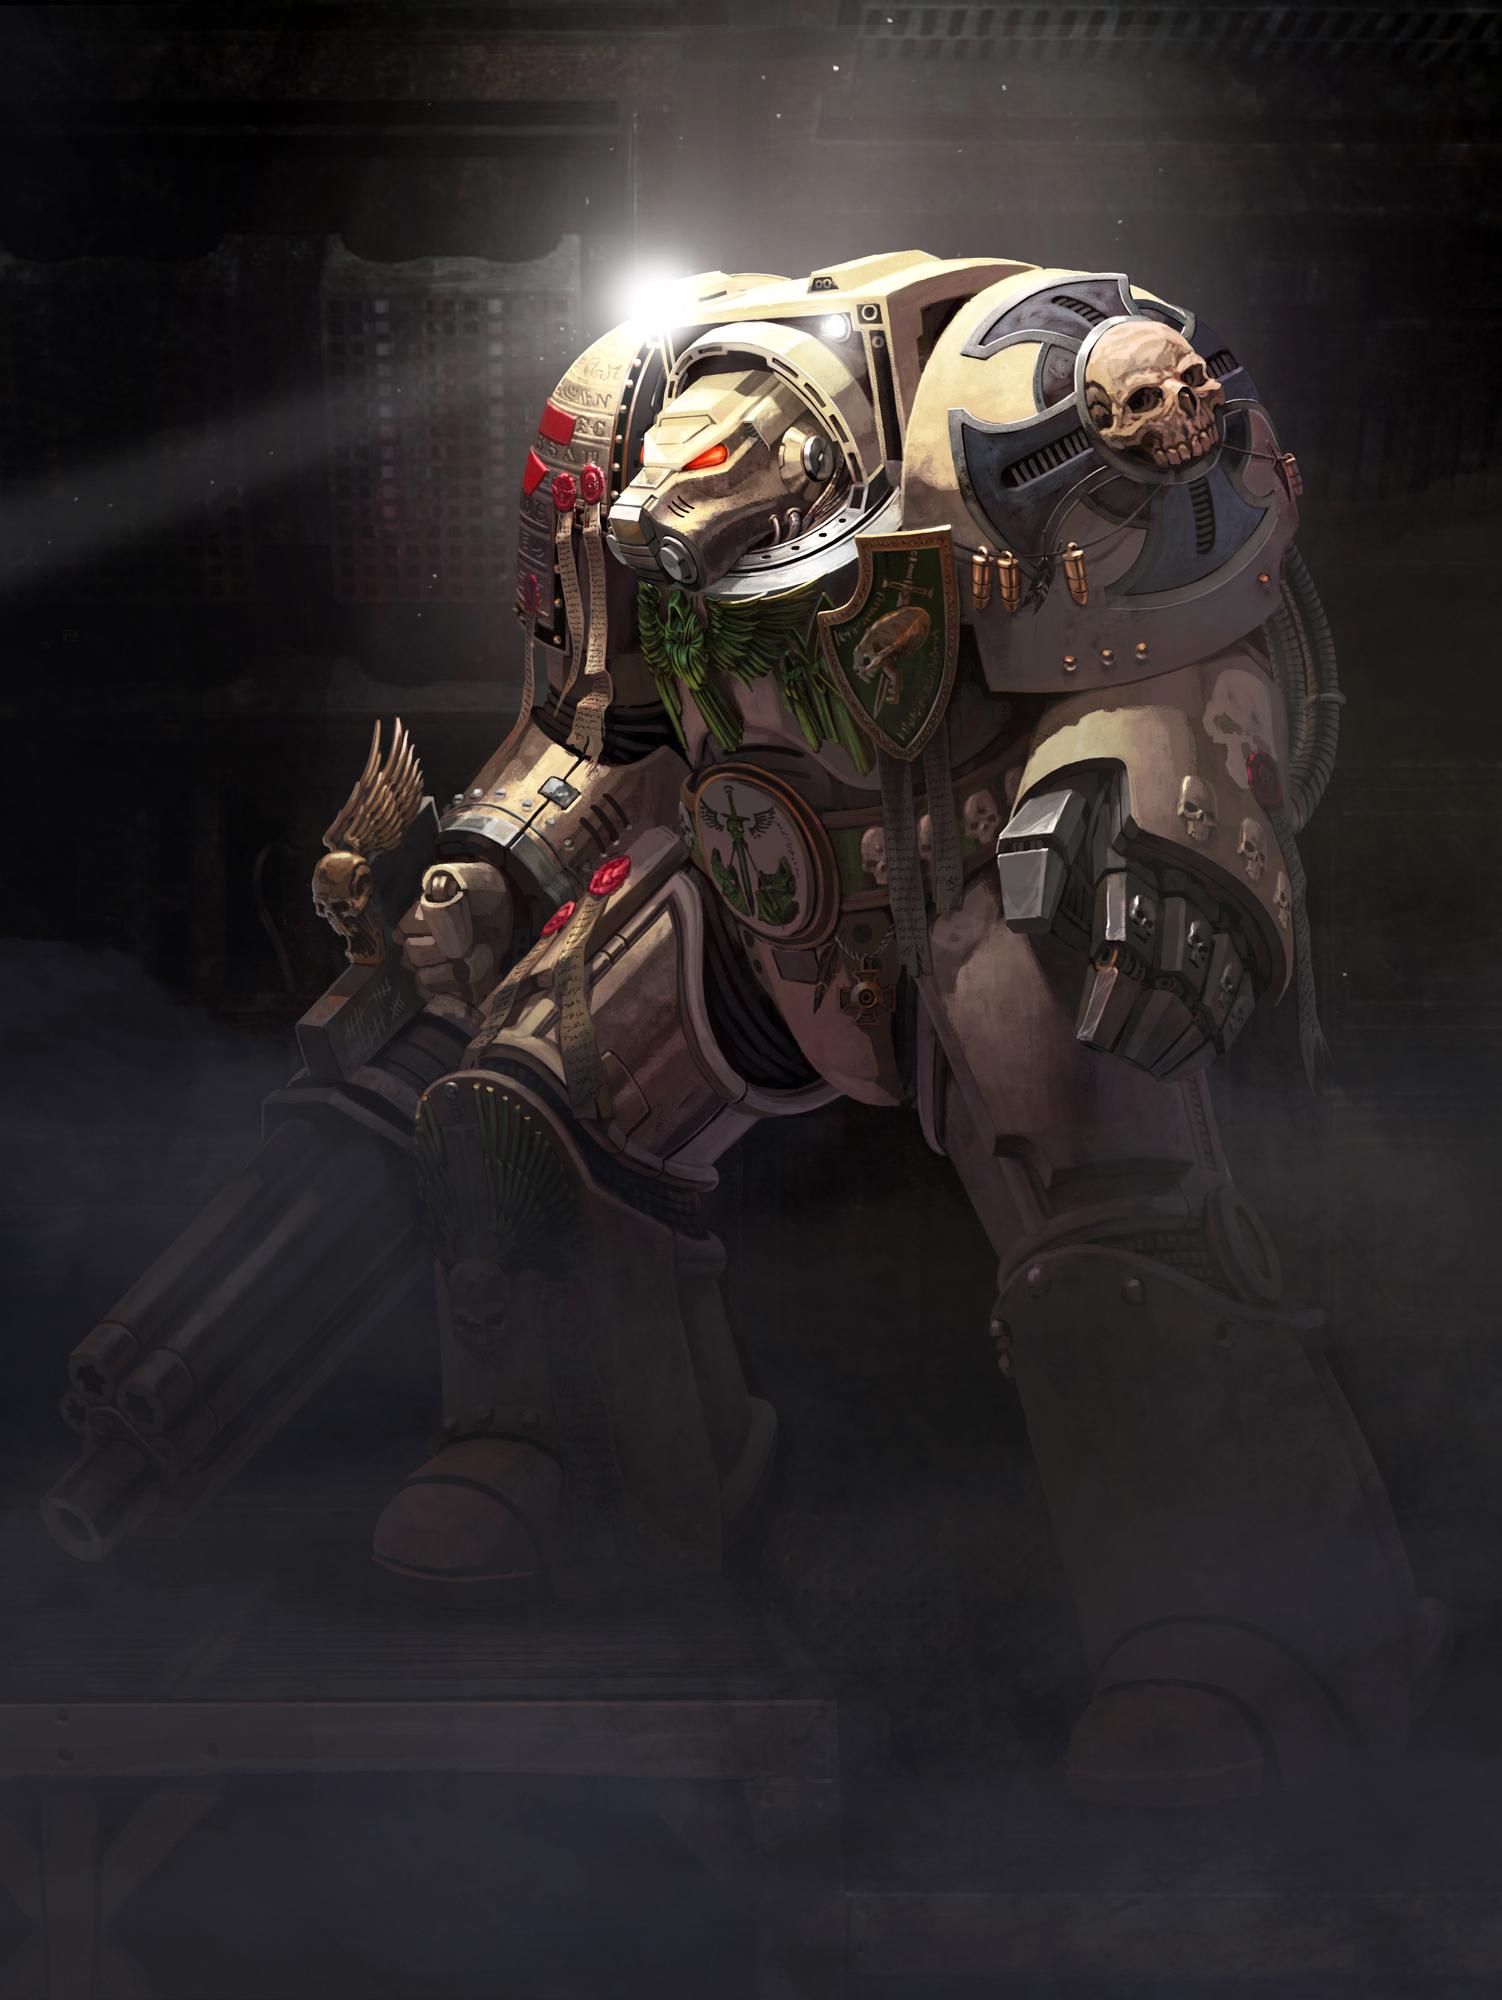 spacehulk-artwork01.jpg